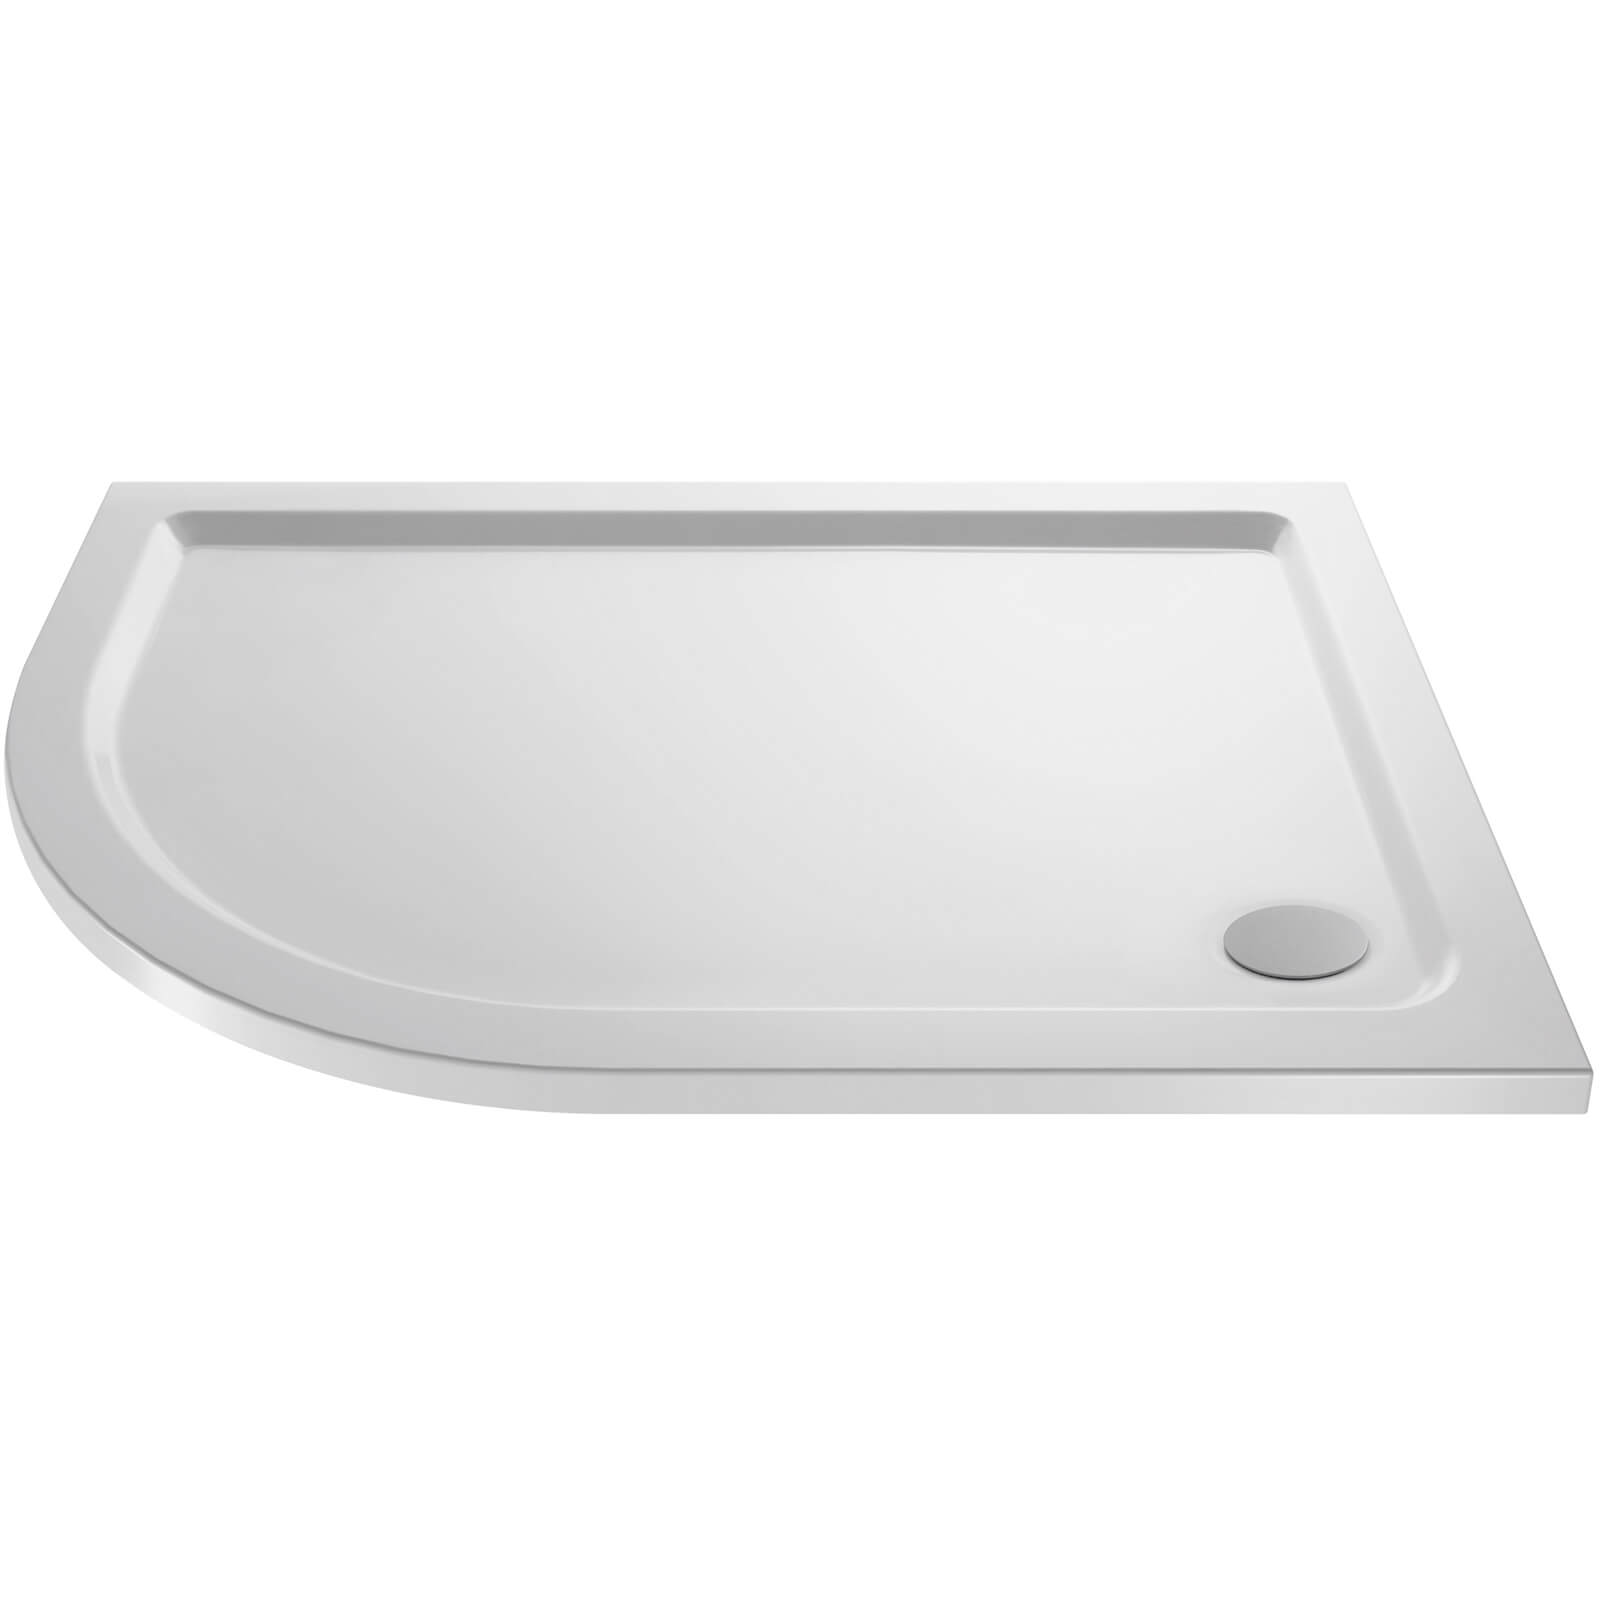 Balterley Left Hand Offset Quadrant Shower Tray - 900 x 760mm